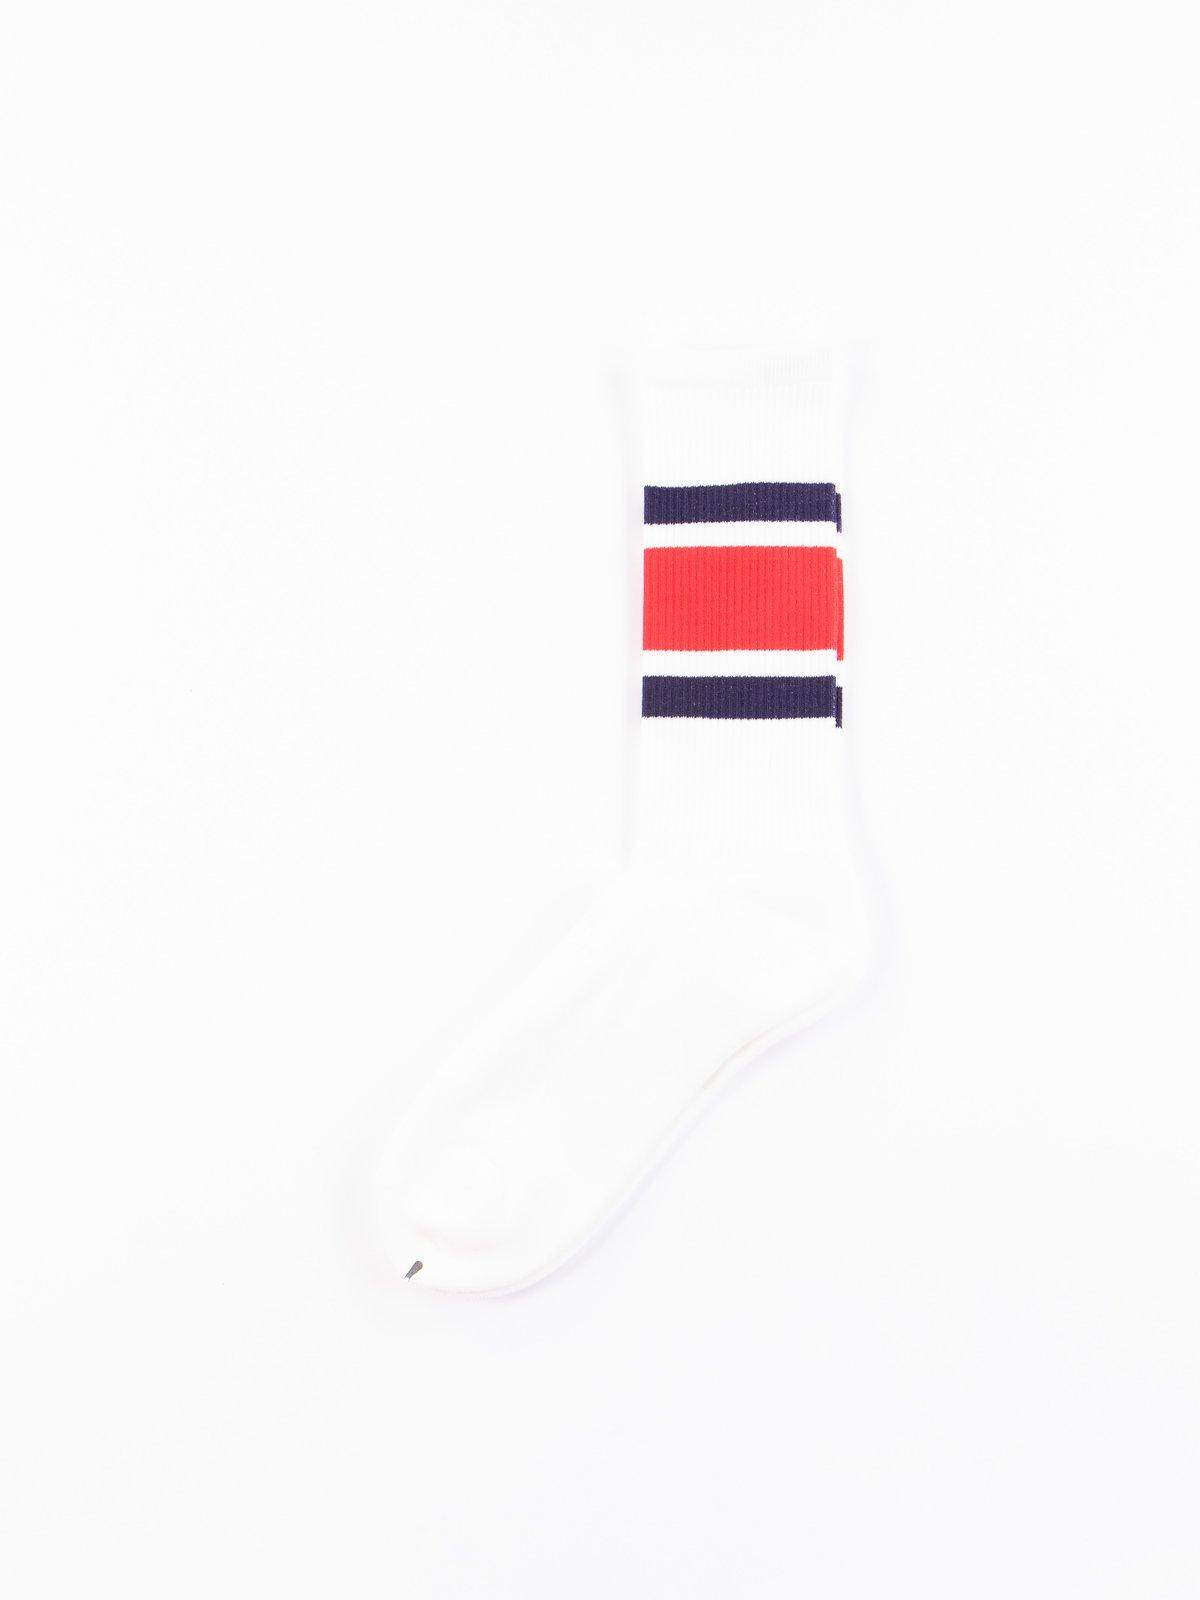 Navy/Red New School Socks - Image 1